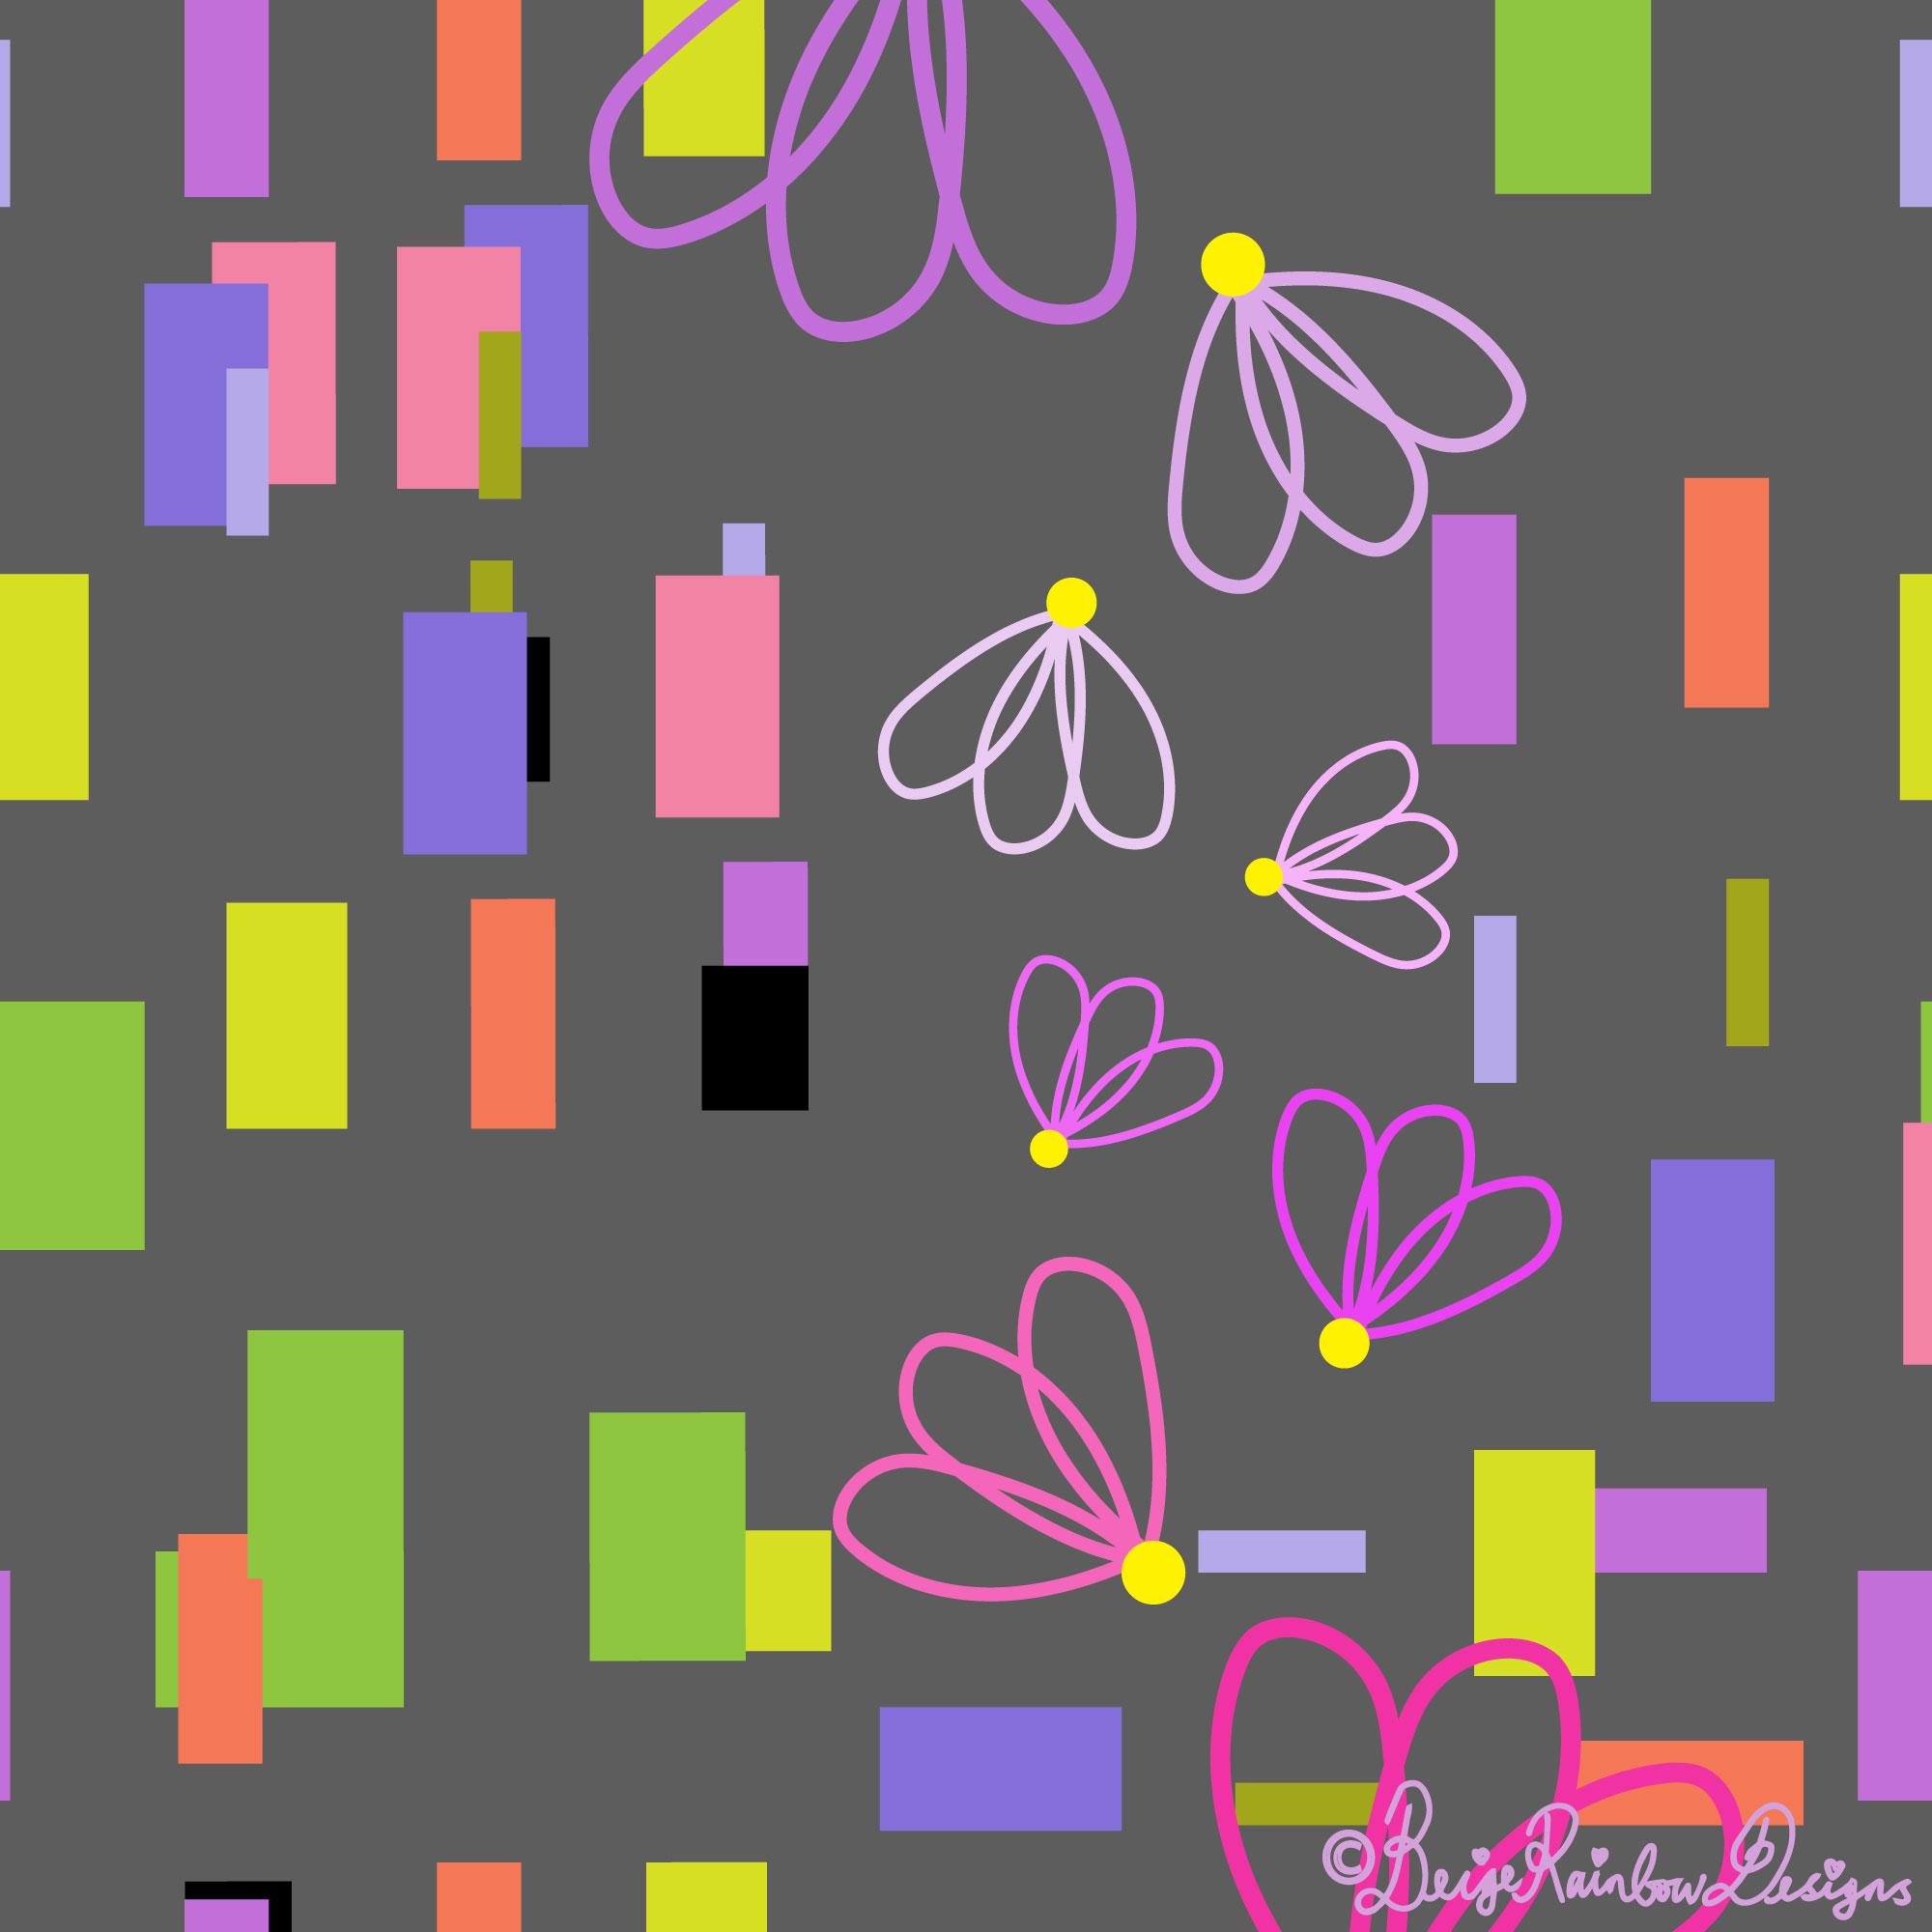 31st-March-3-for-webby.jpg